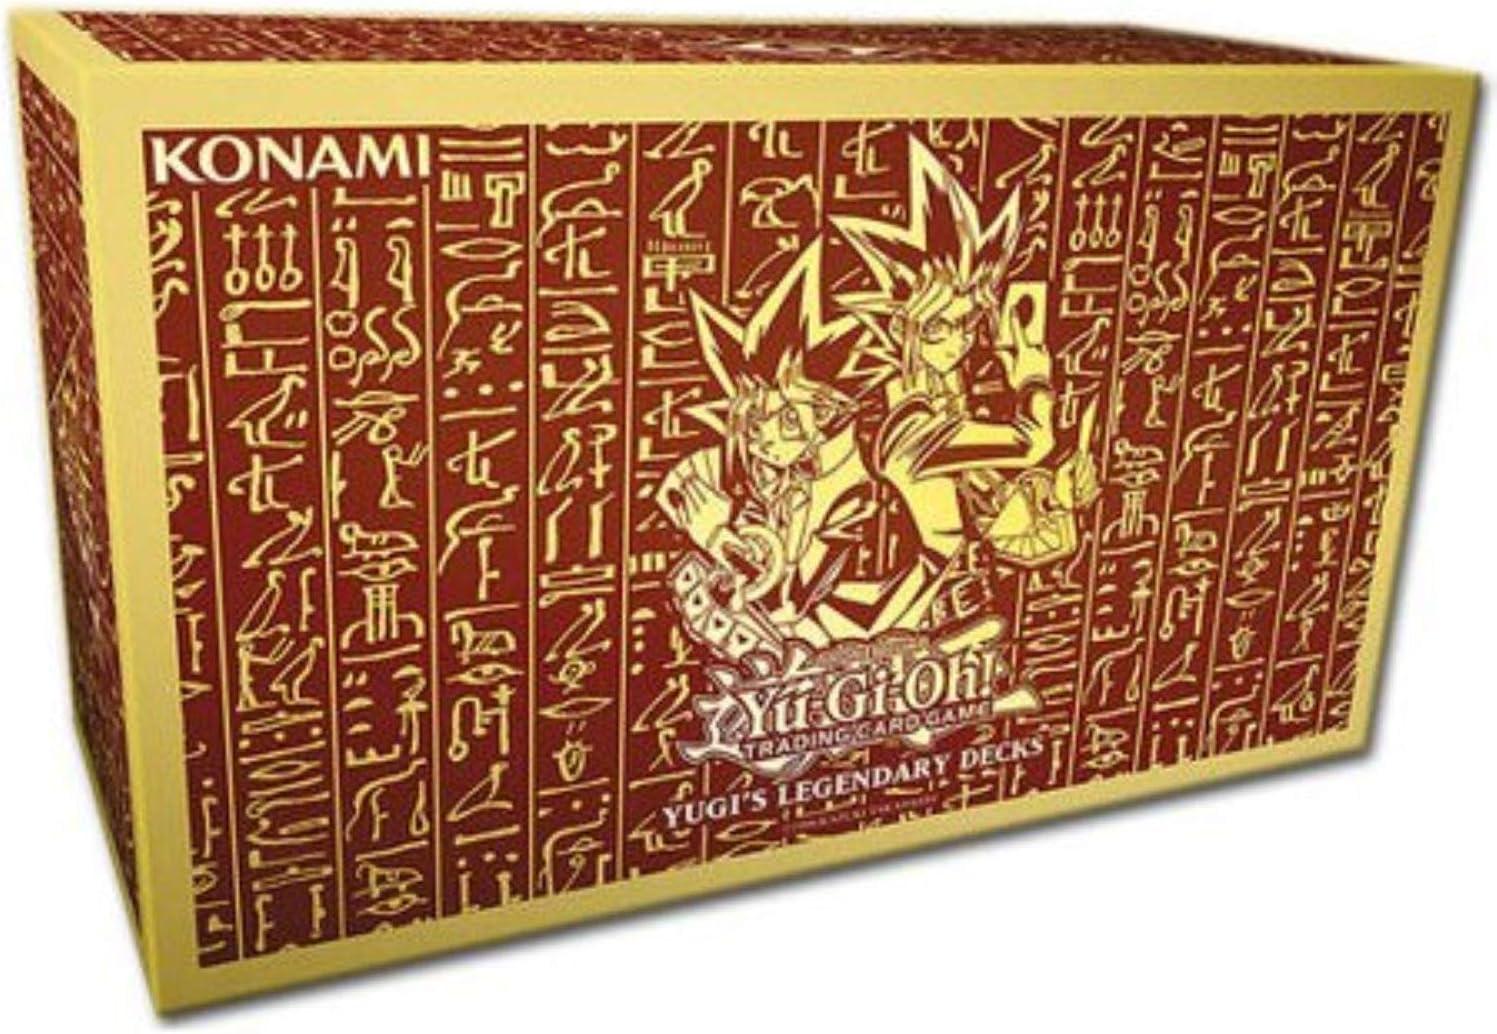 Yu-Gi-Oh! Cards - Yugi Legendary Decks 1 | Genuine Cards